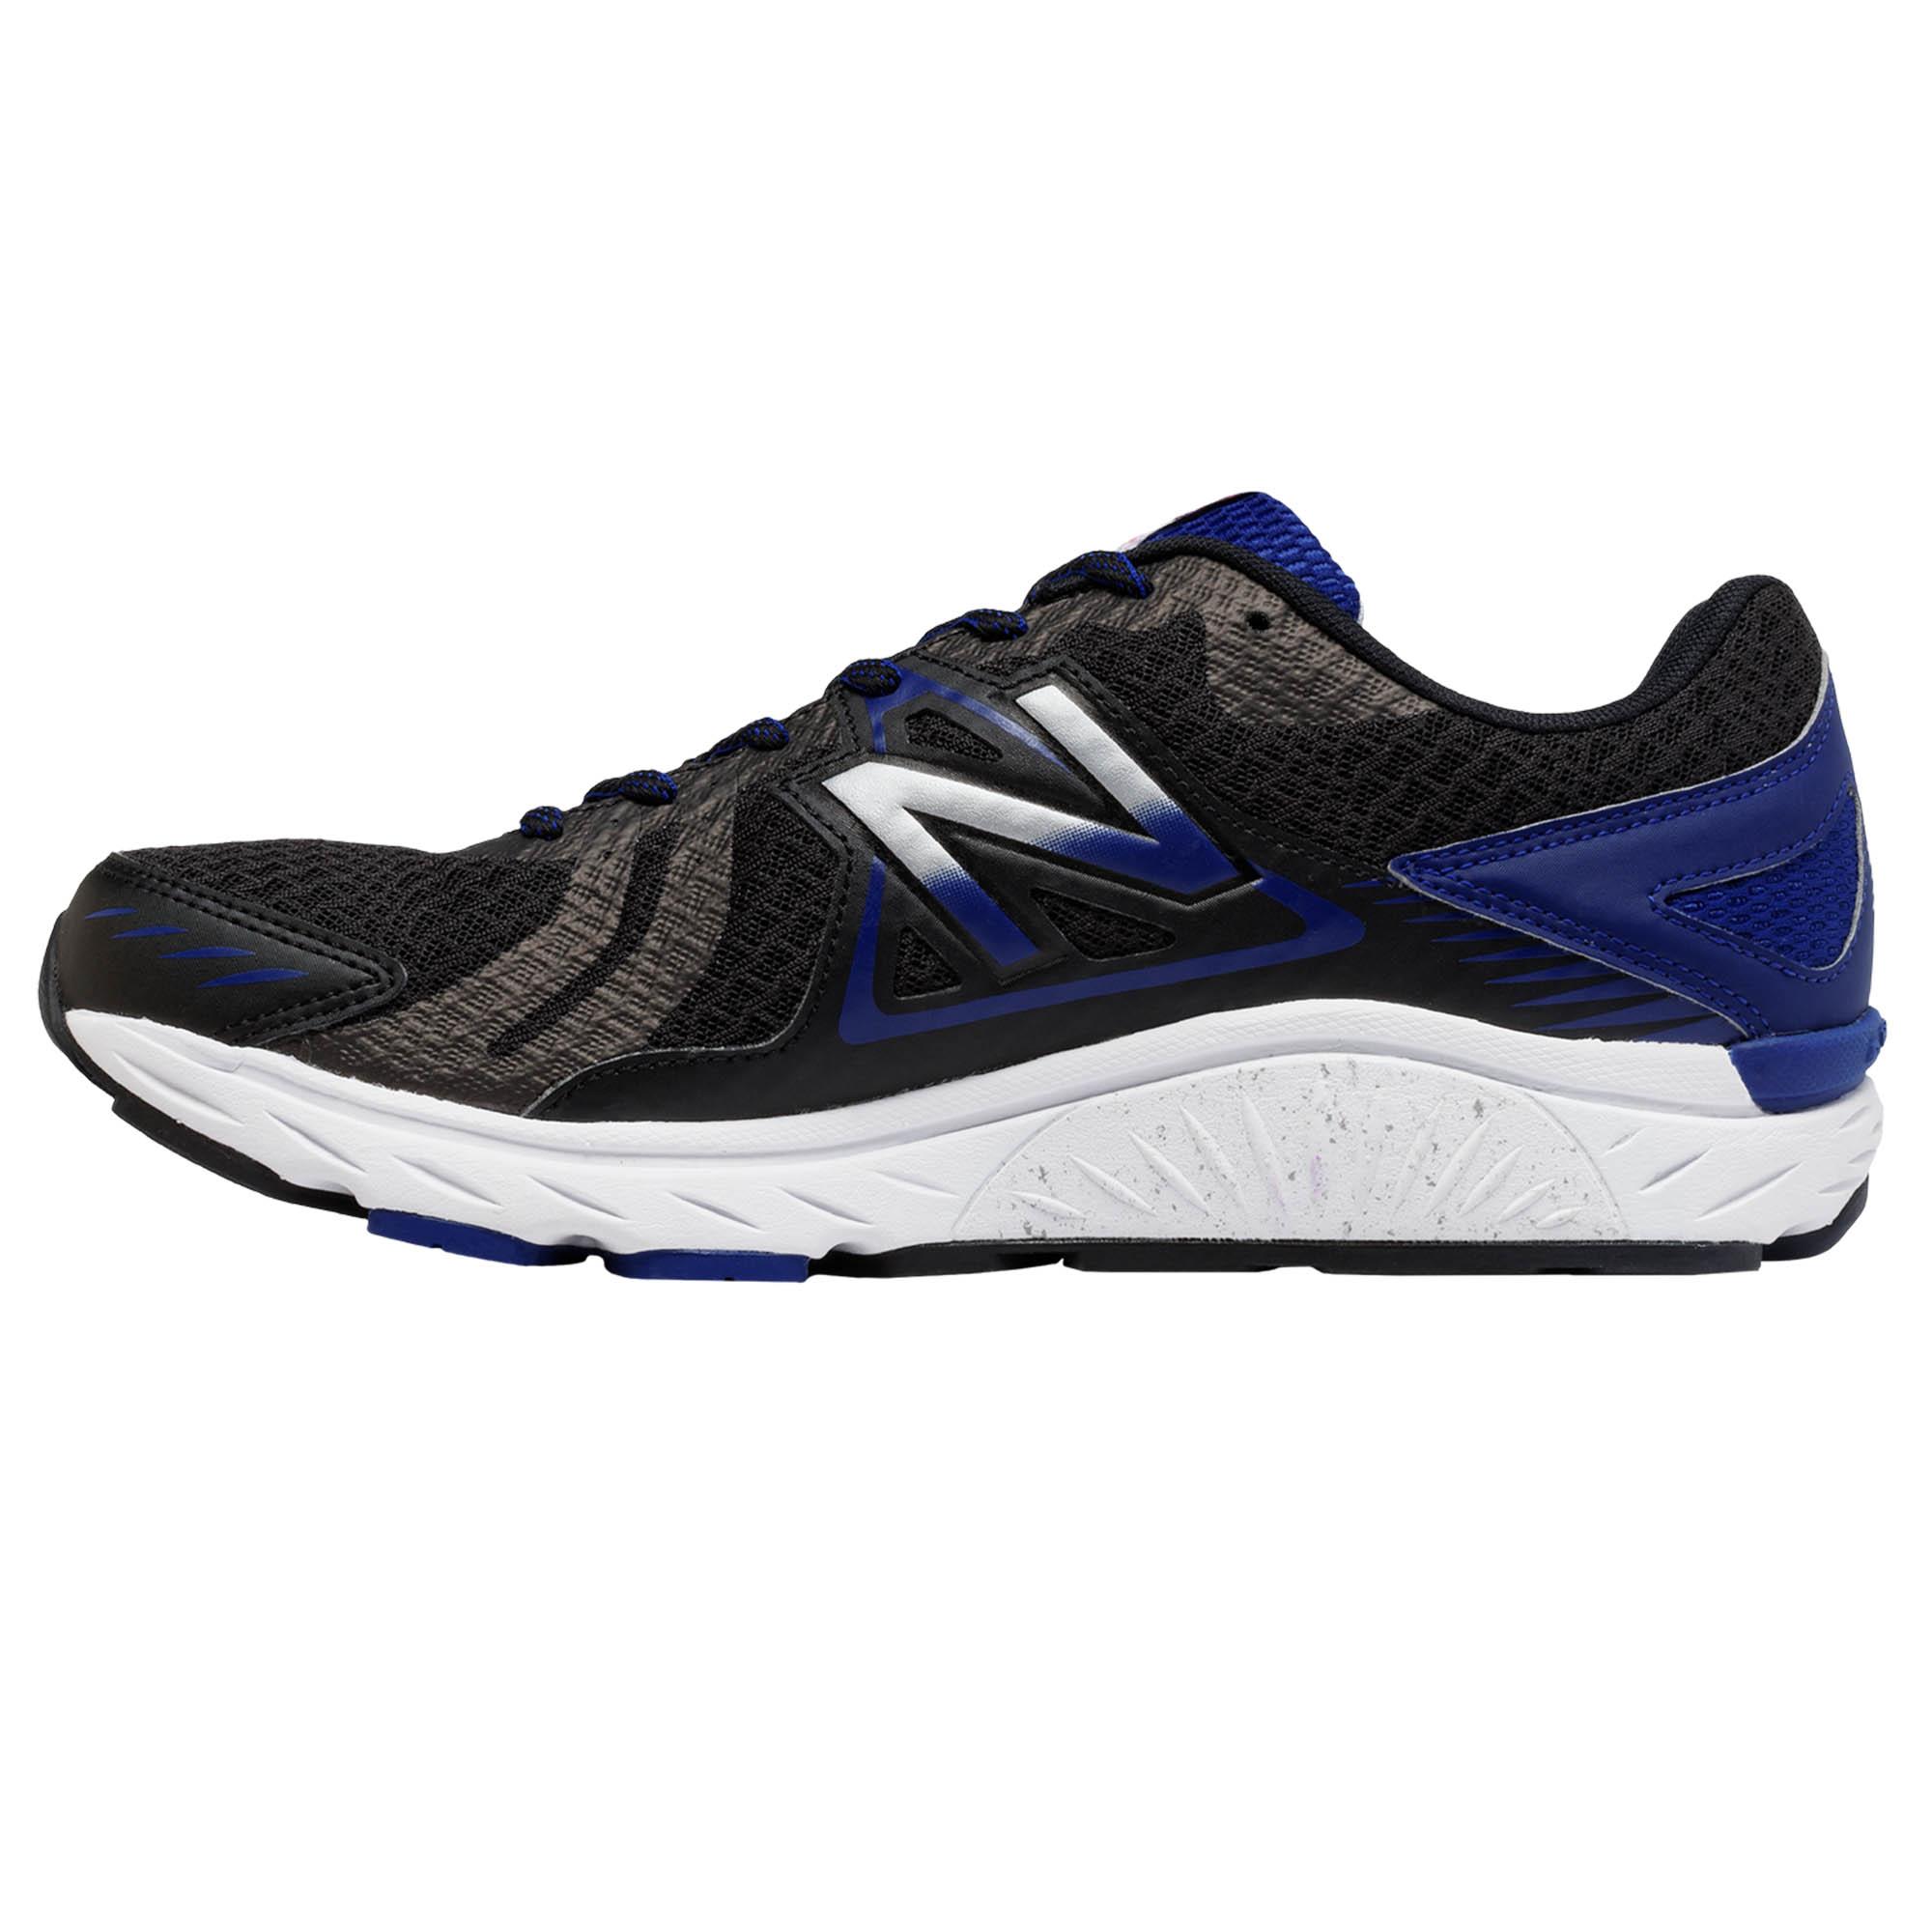 Best Light Weight Running Shoes Stability